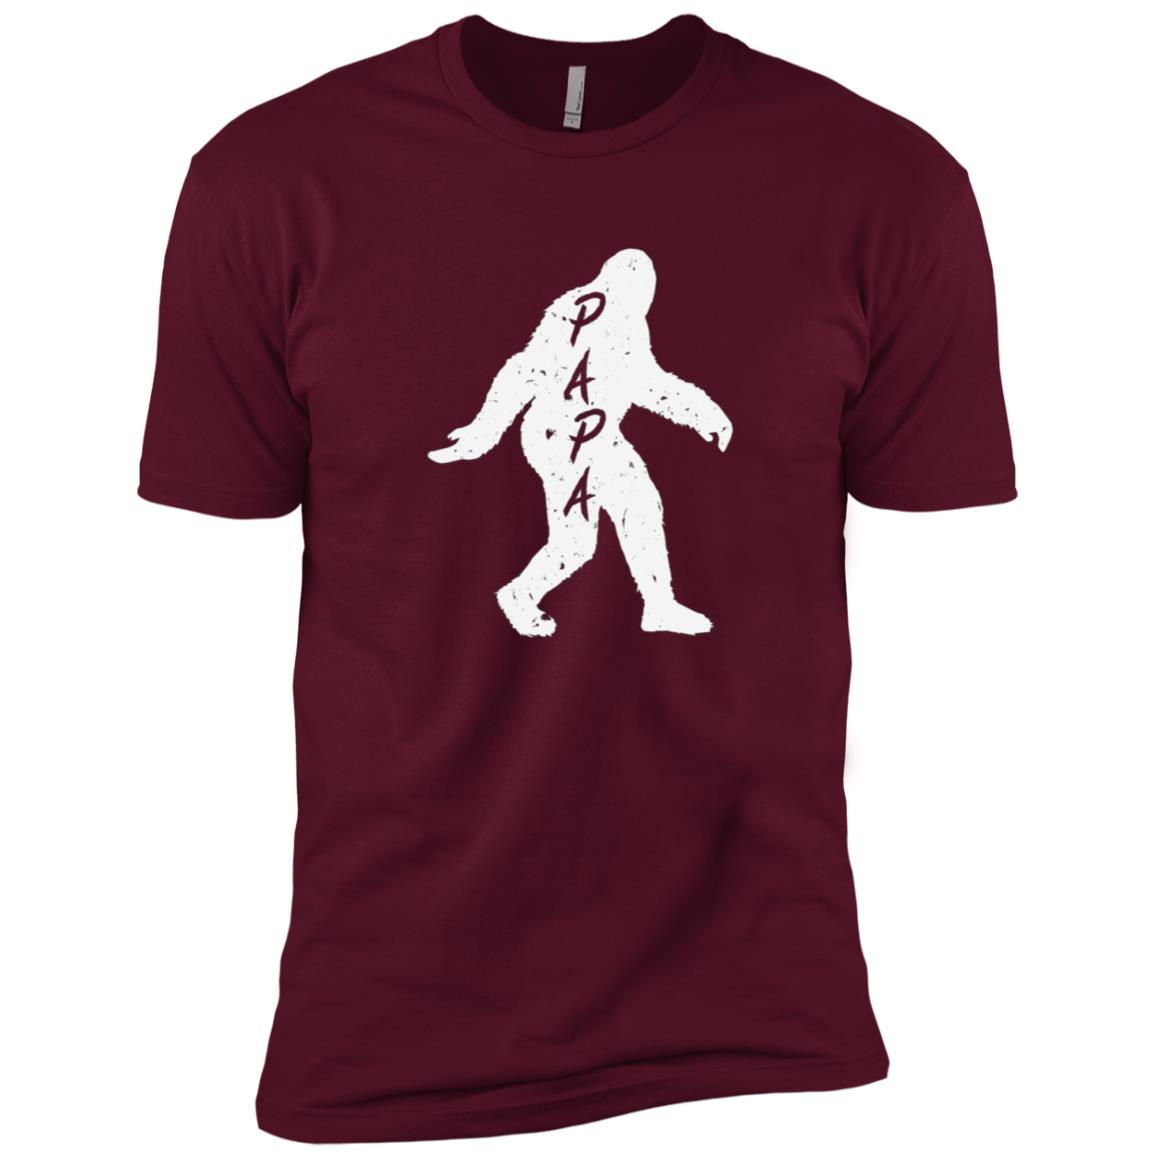 Papa Bigfoot Sasquatch Yeti Fathers Day Gift Tee Men Short Sleeve T-Shirt